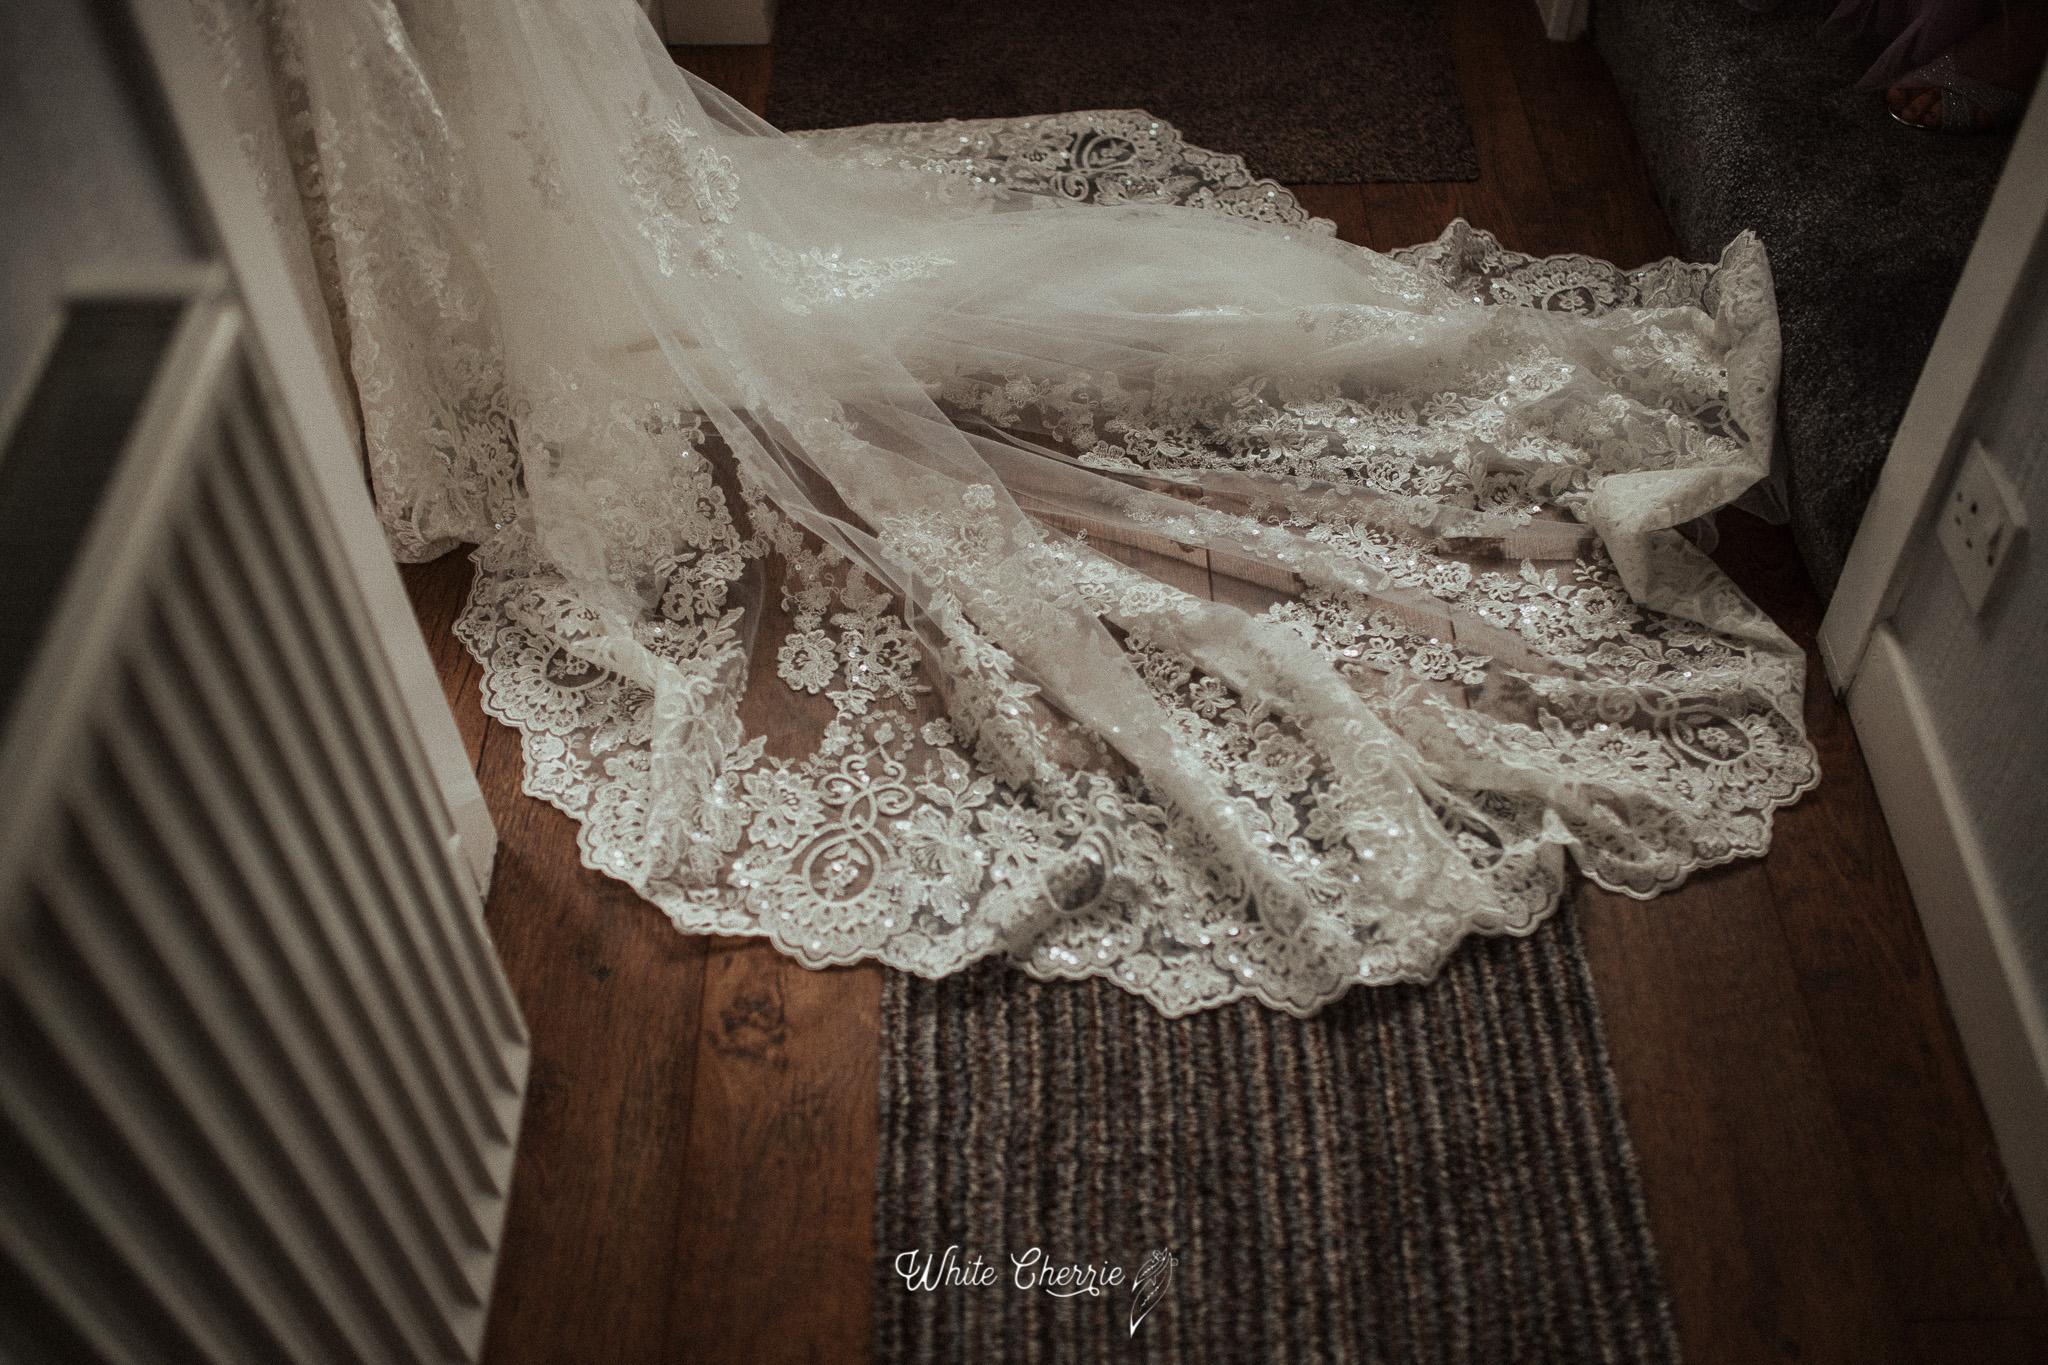 White_Cherrie-Lucy_Ben-28.jpg